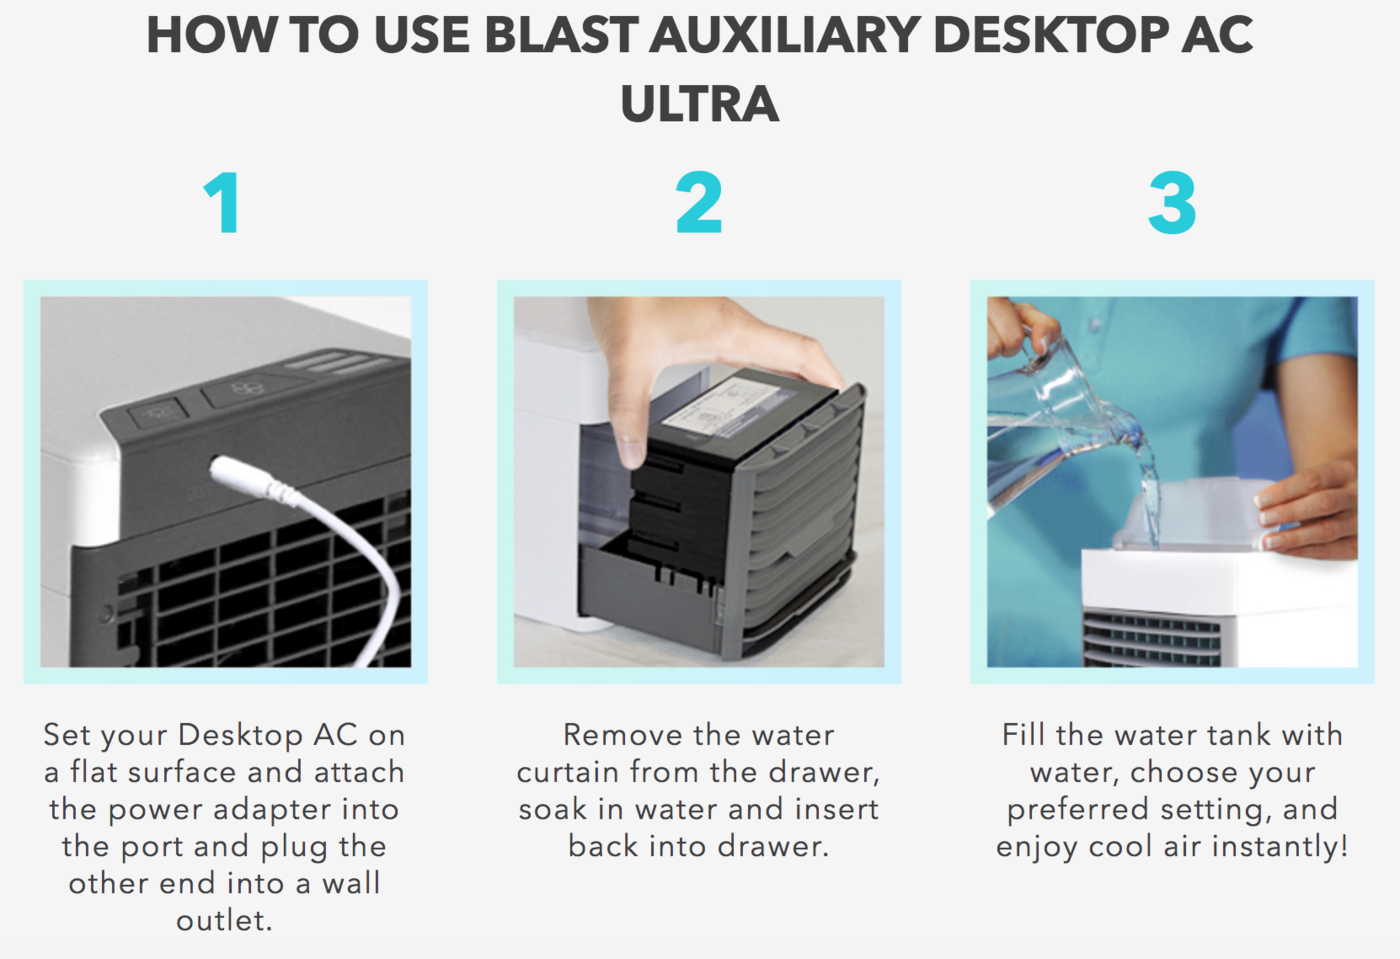 blast auxiliary desktop ultra ac